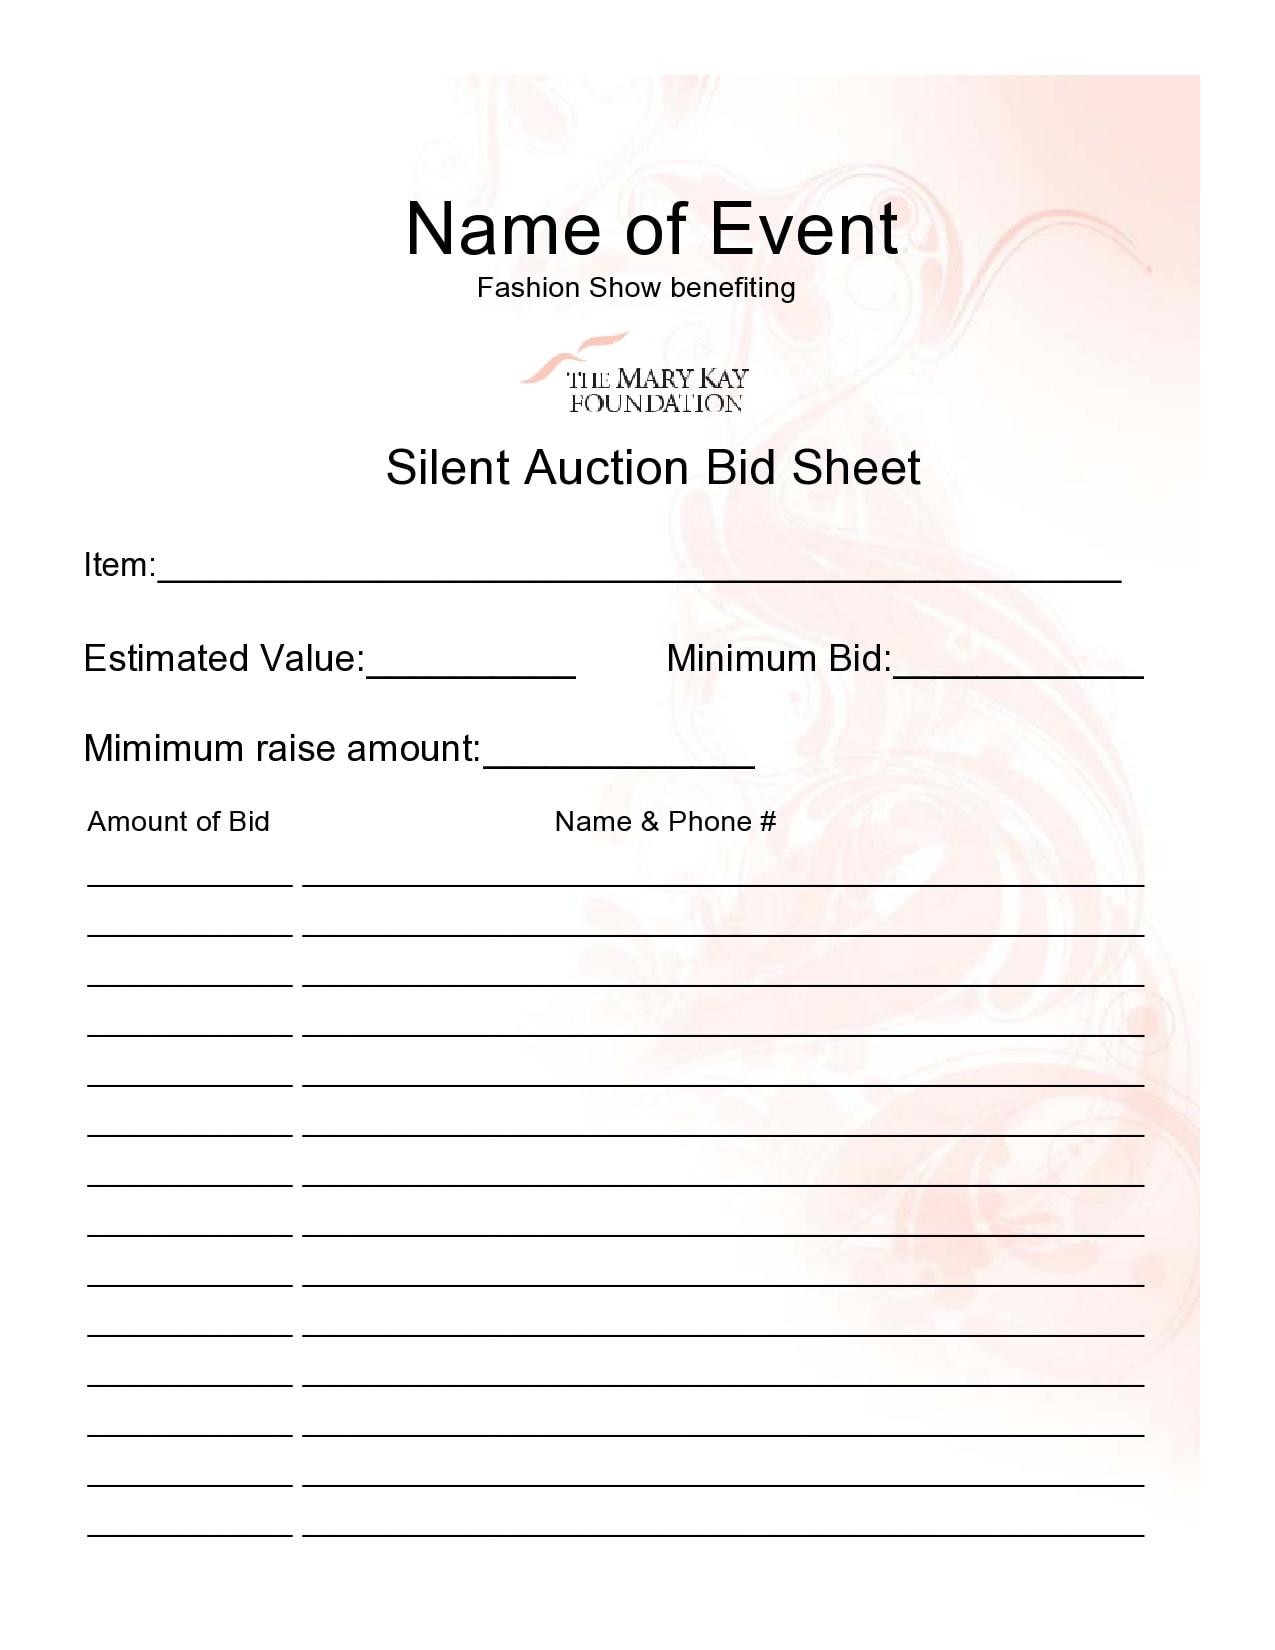 silent auction bid sheet 23